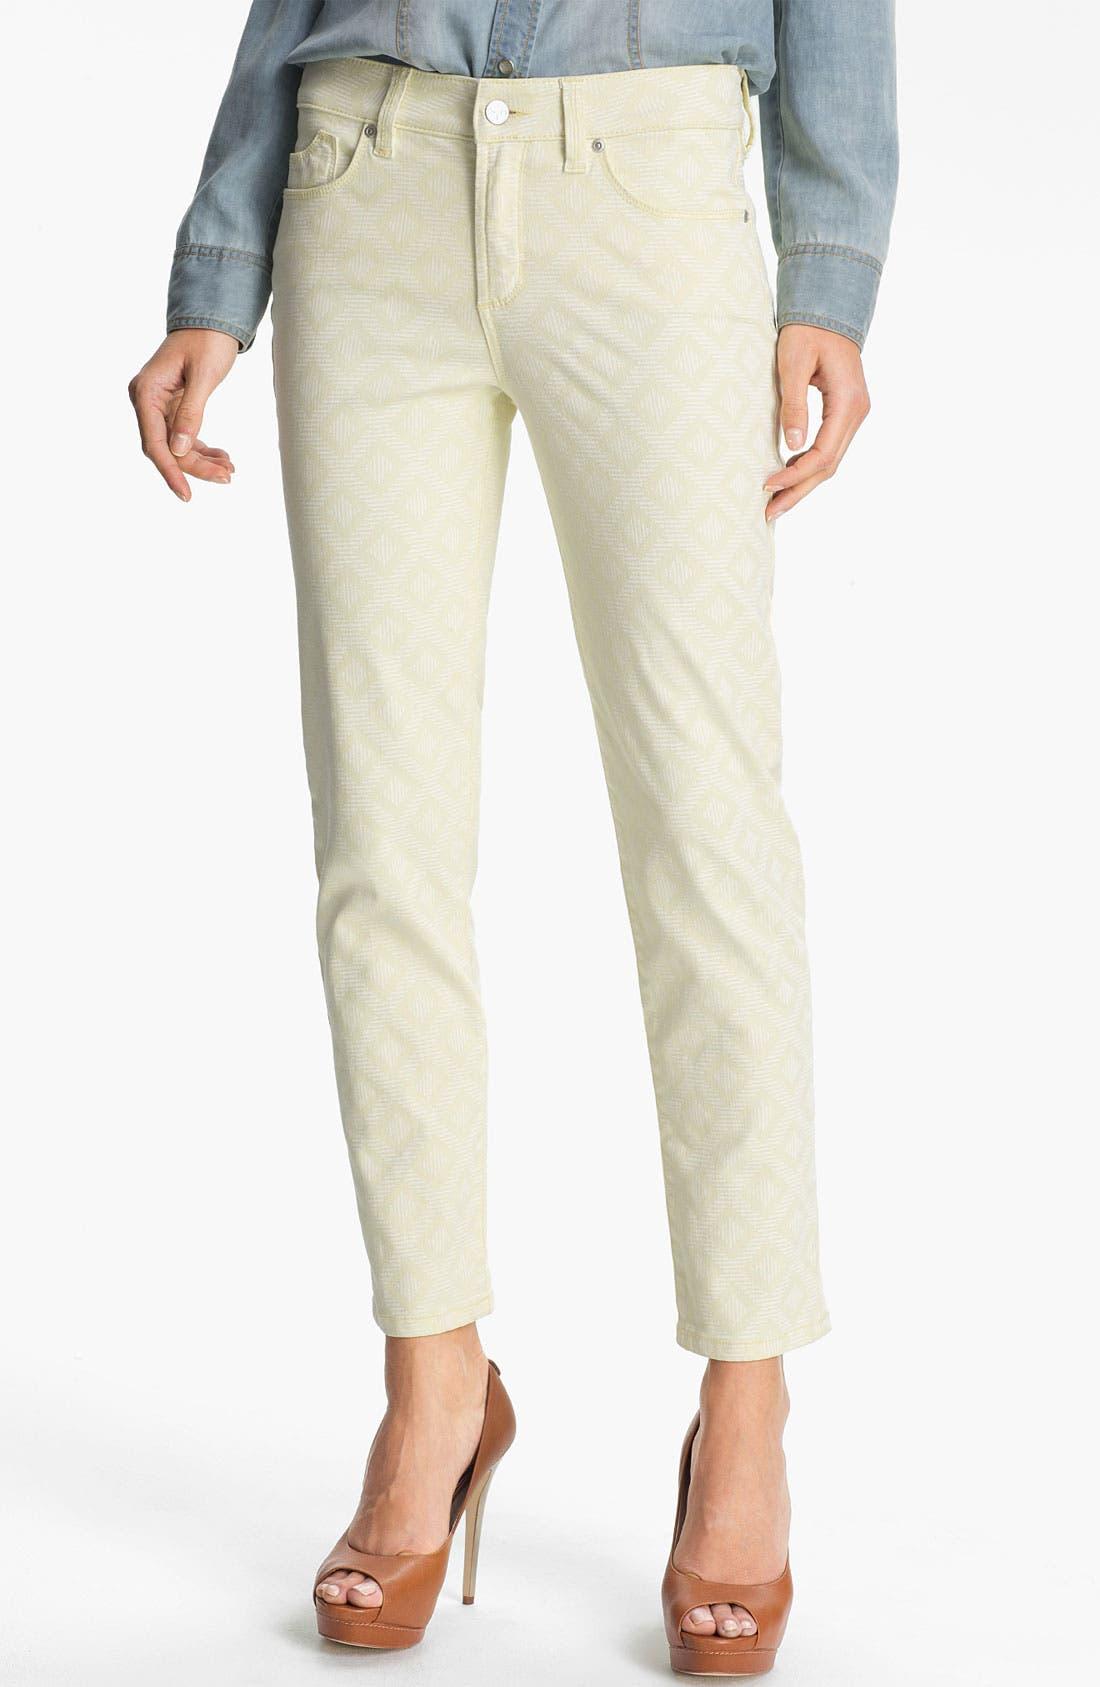 Alternate Image 1 Selected - NYDJ 'Alisha - Jacquard' Skinny Stretch Ankle Jeans